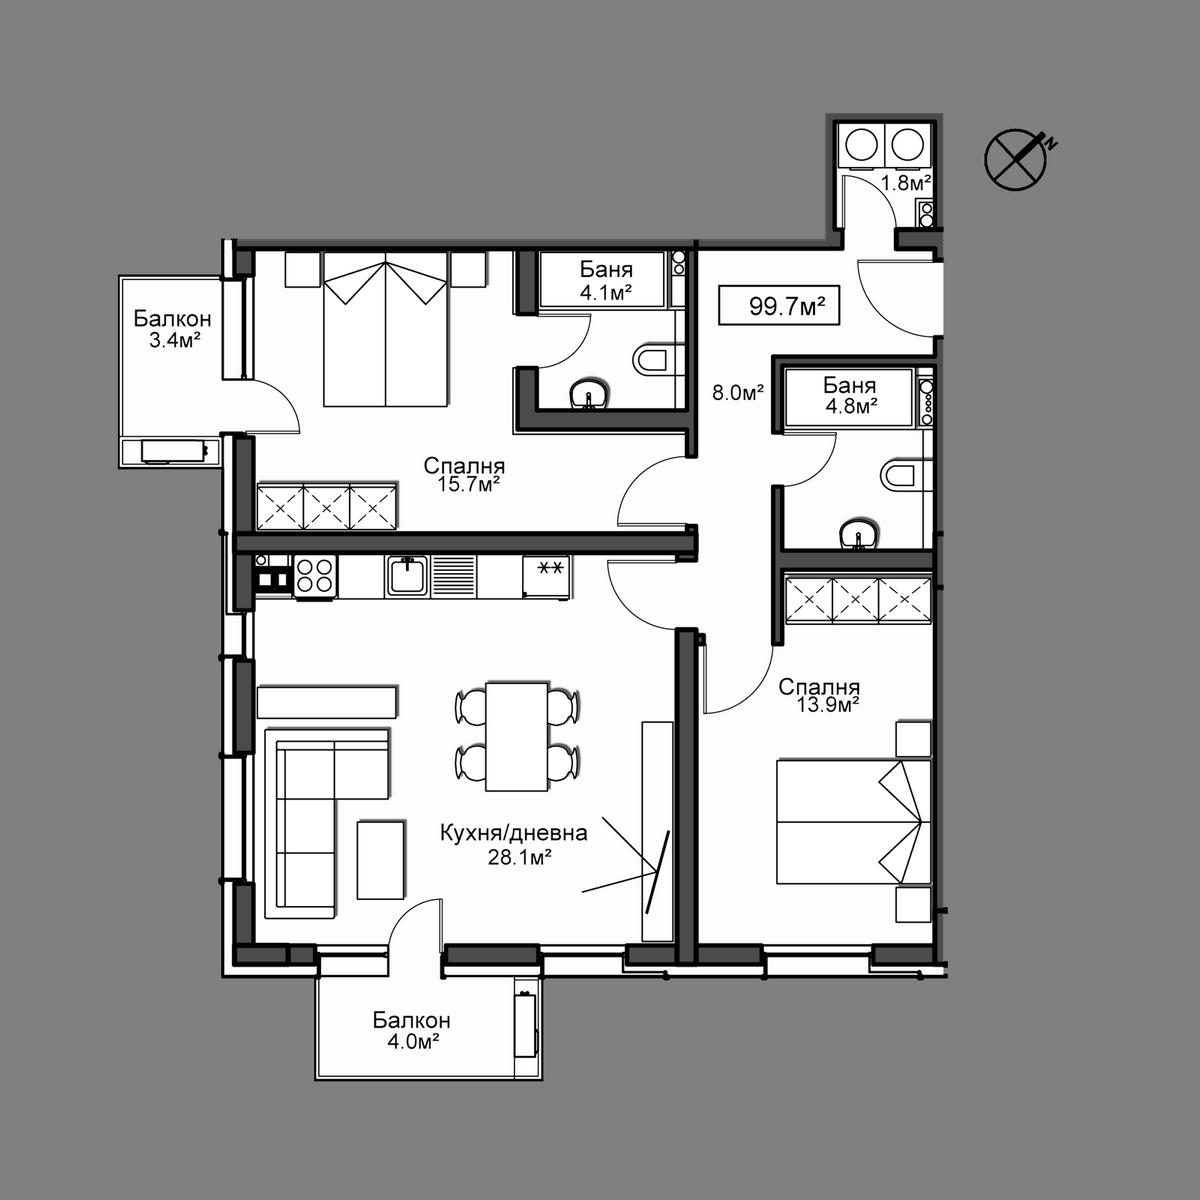 Продава апартамент ново строителство - Апартамент 46